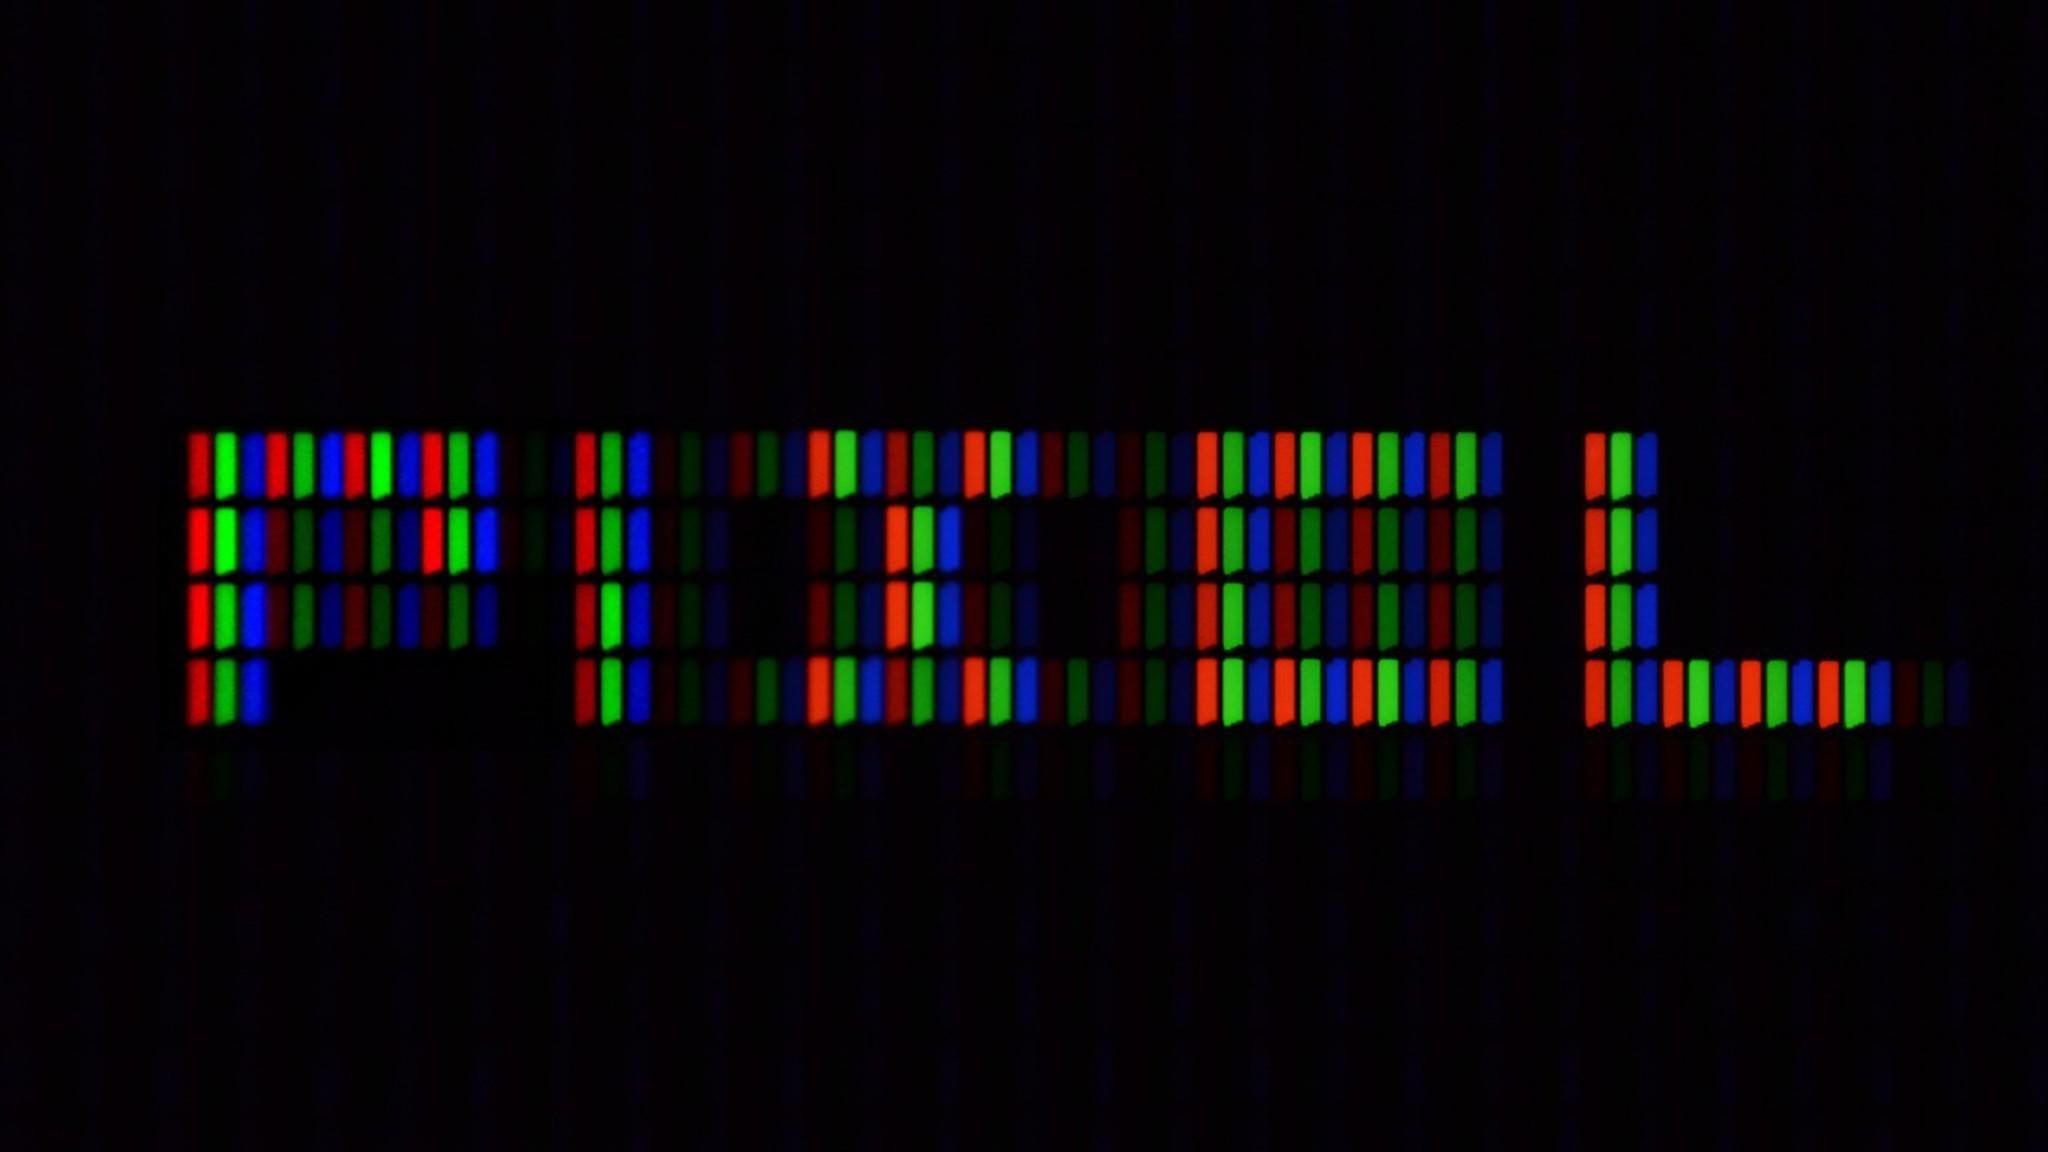 2048 By 1152 Pixels Wallpaper 71 Images